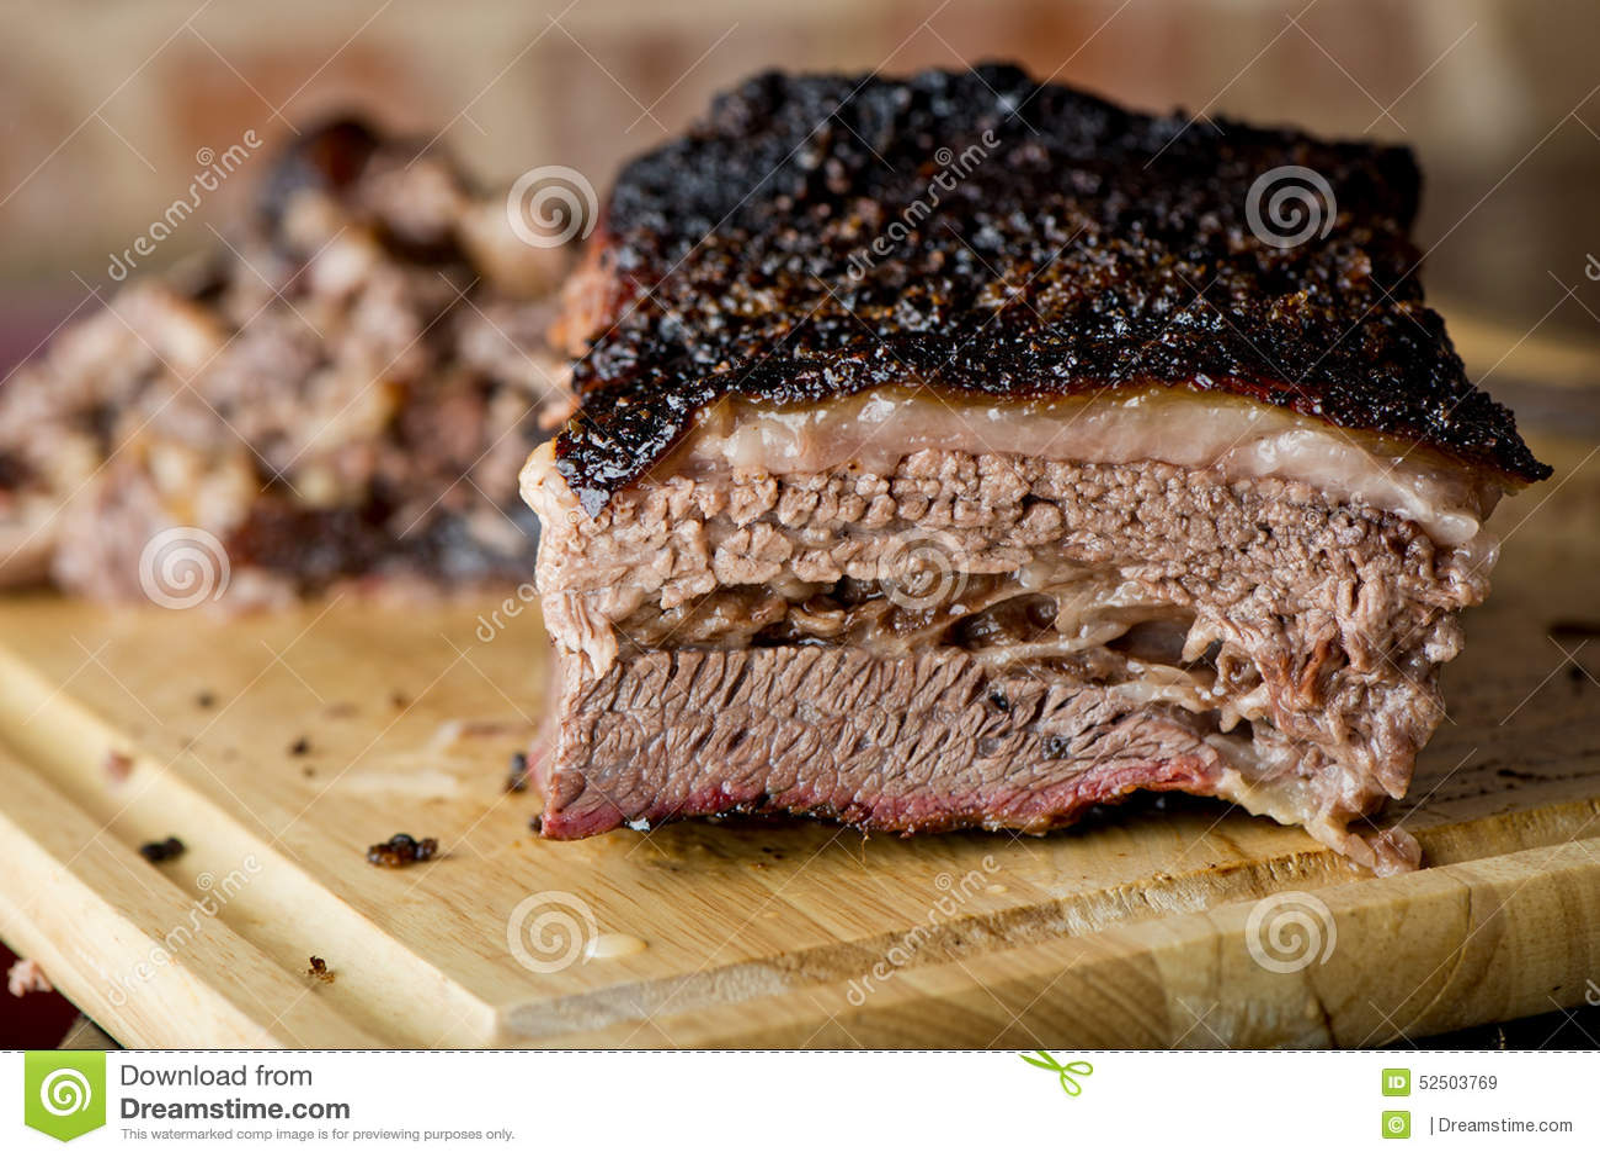 Classic Texas Smoked Beef Brisket